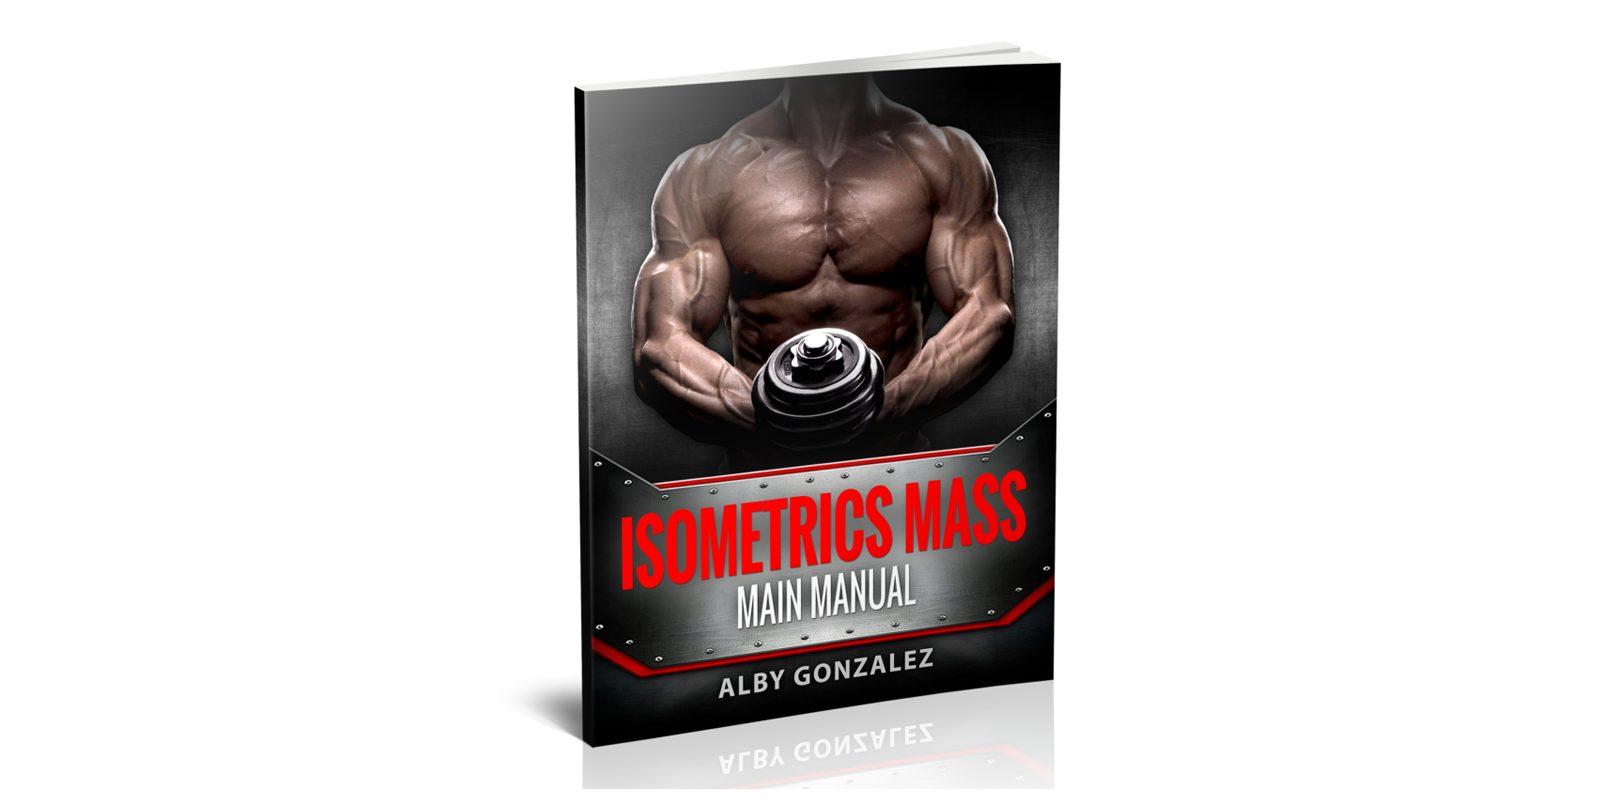 Isometrics Mass Review